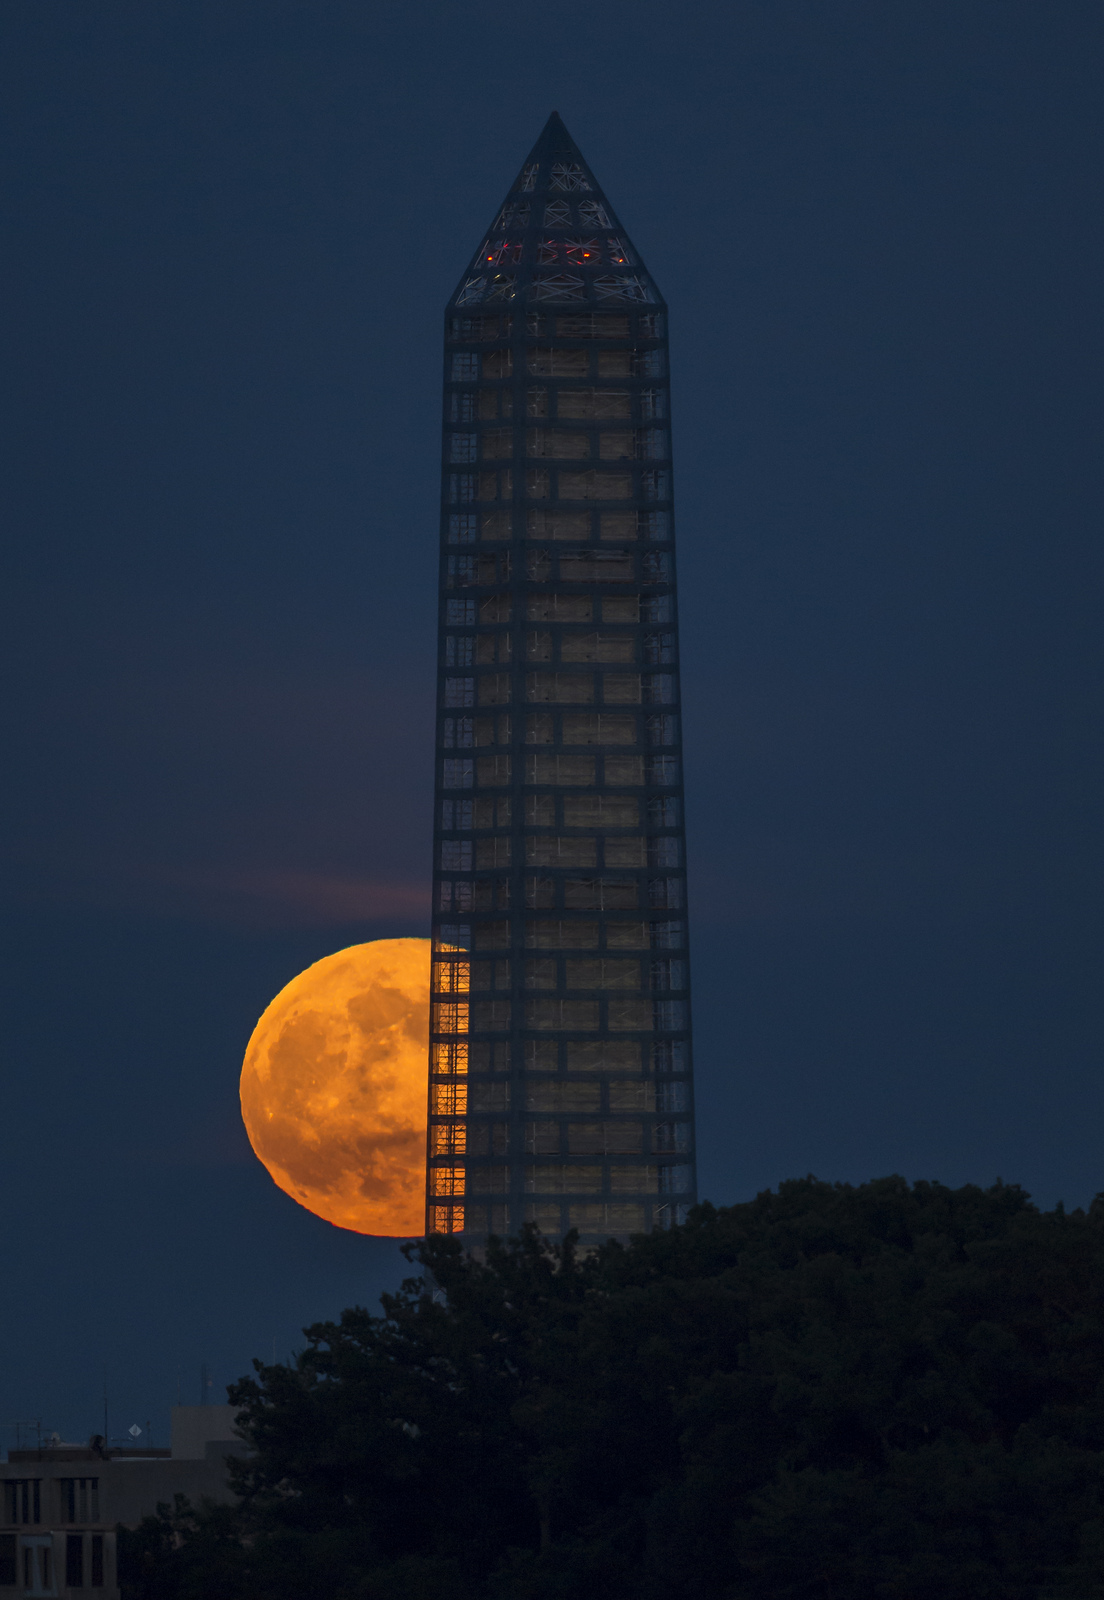 Supermoon Rises Over Washington Monument